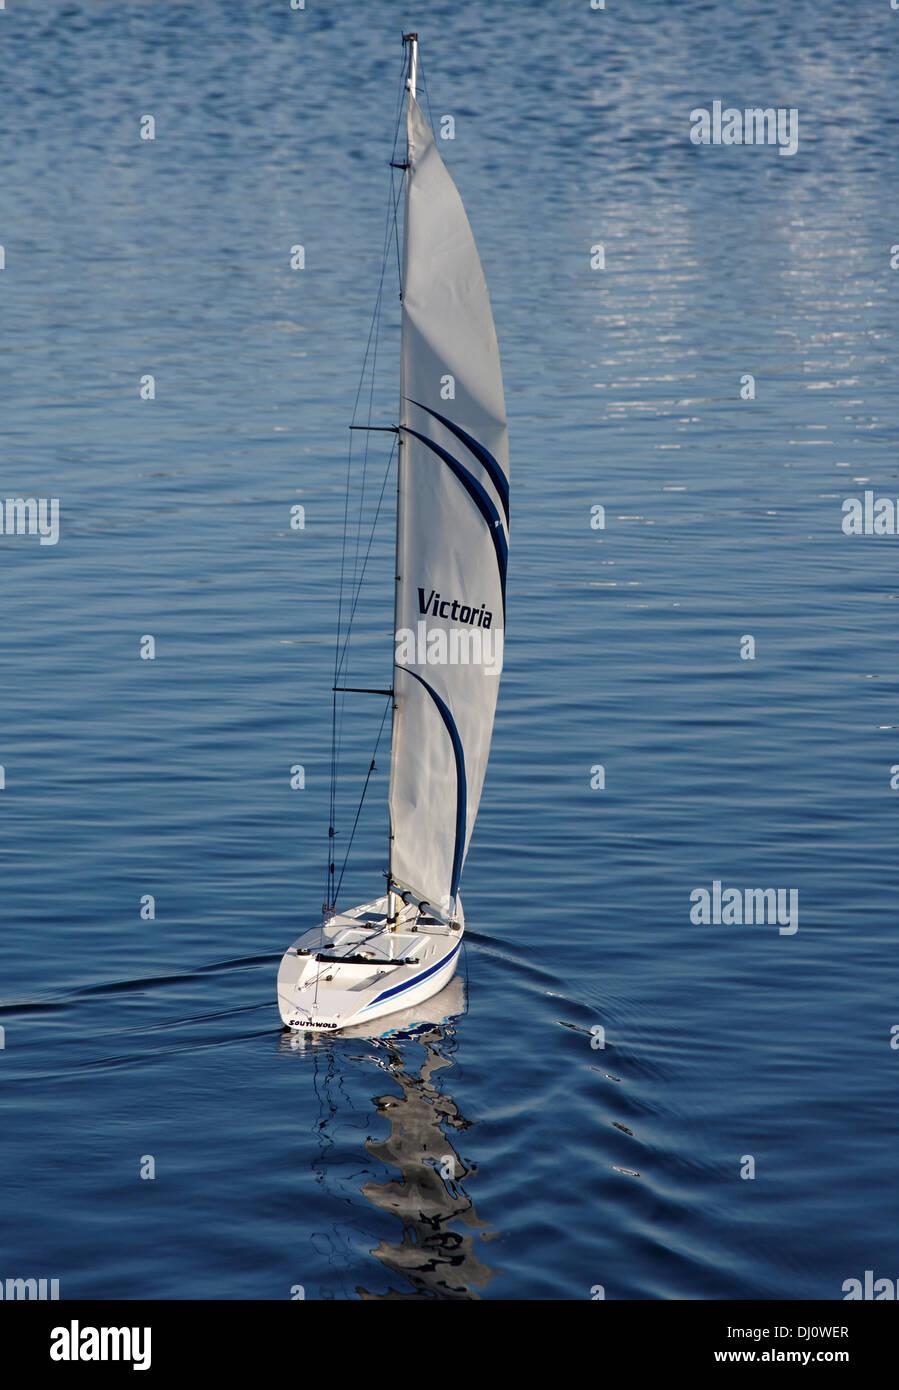 Radio Controlled model yacht - Stock Image